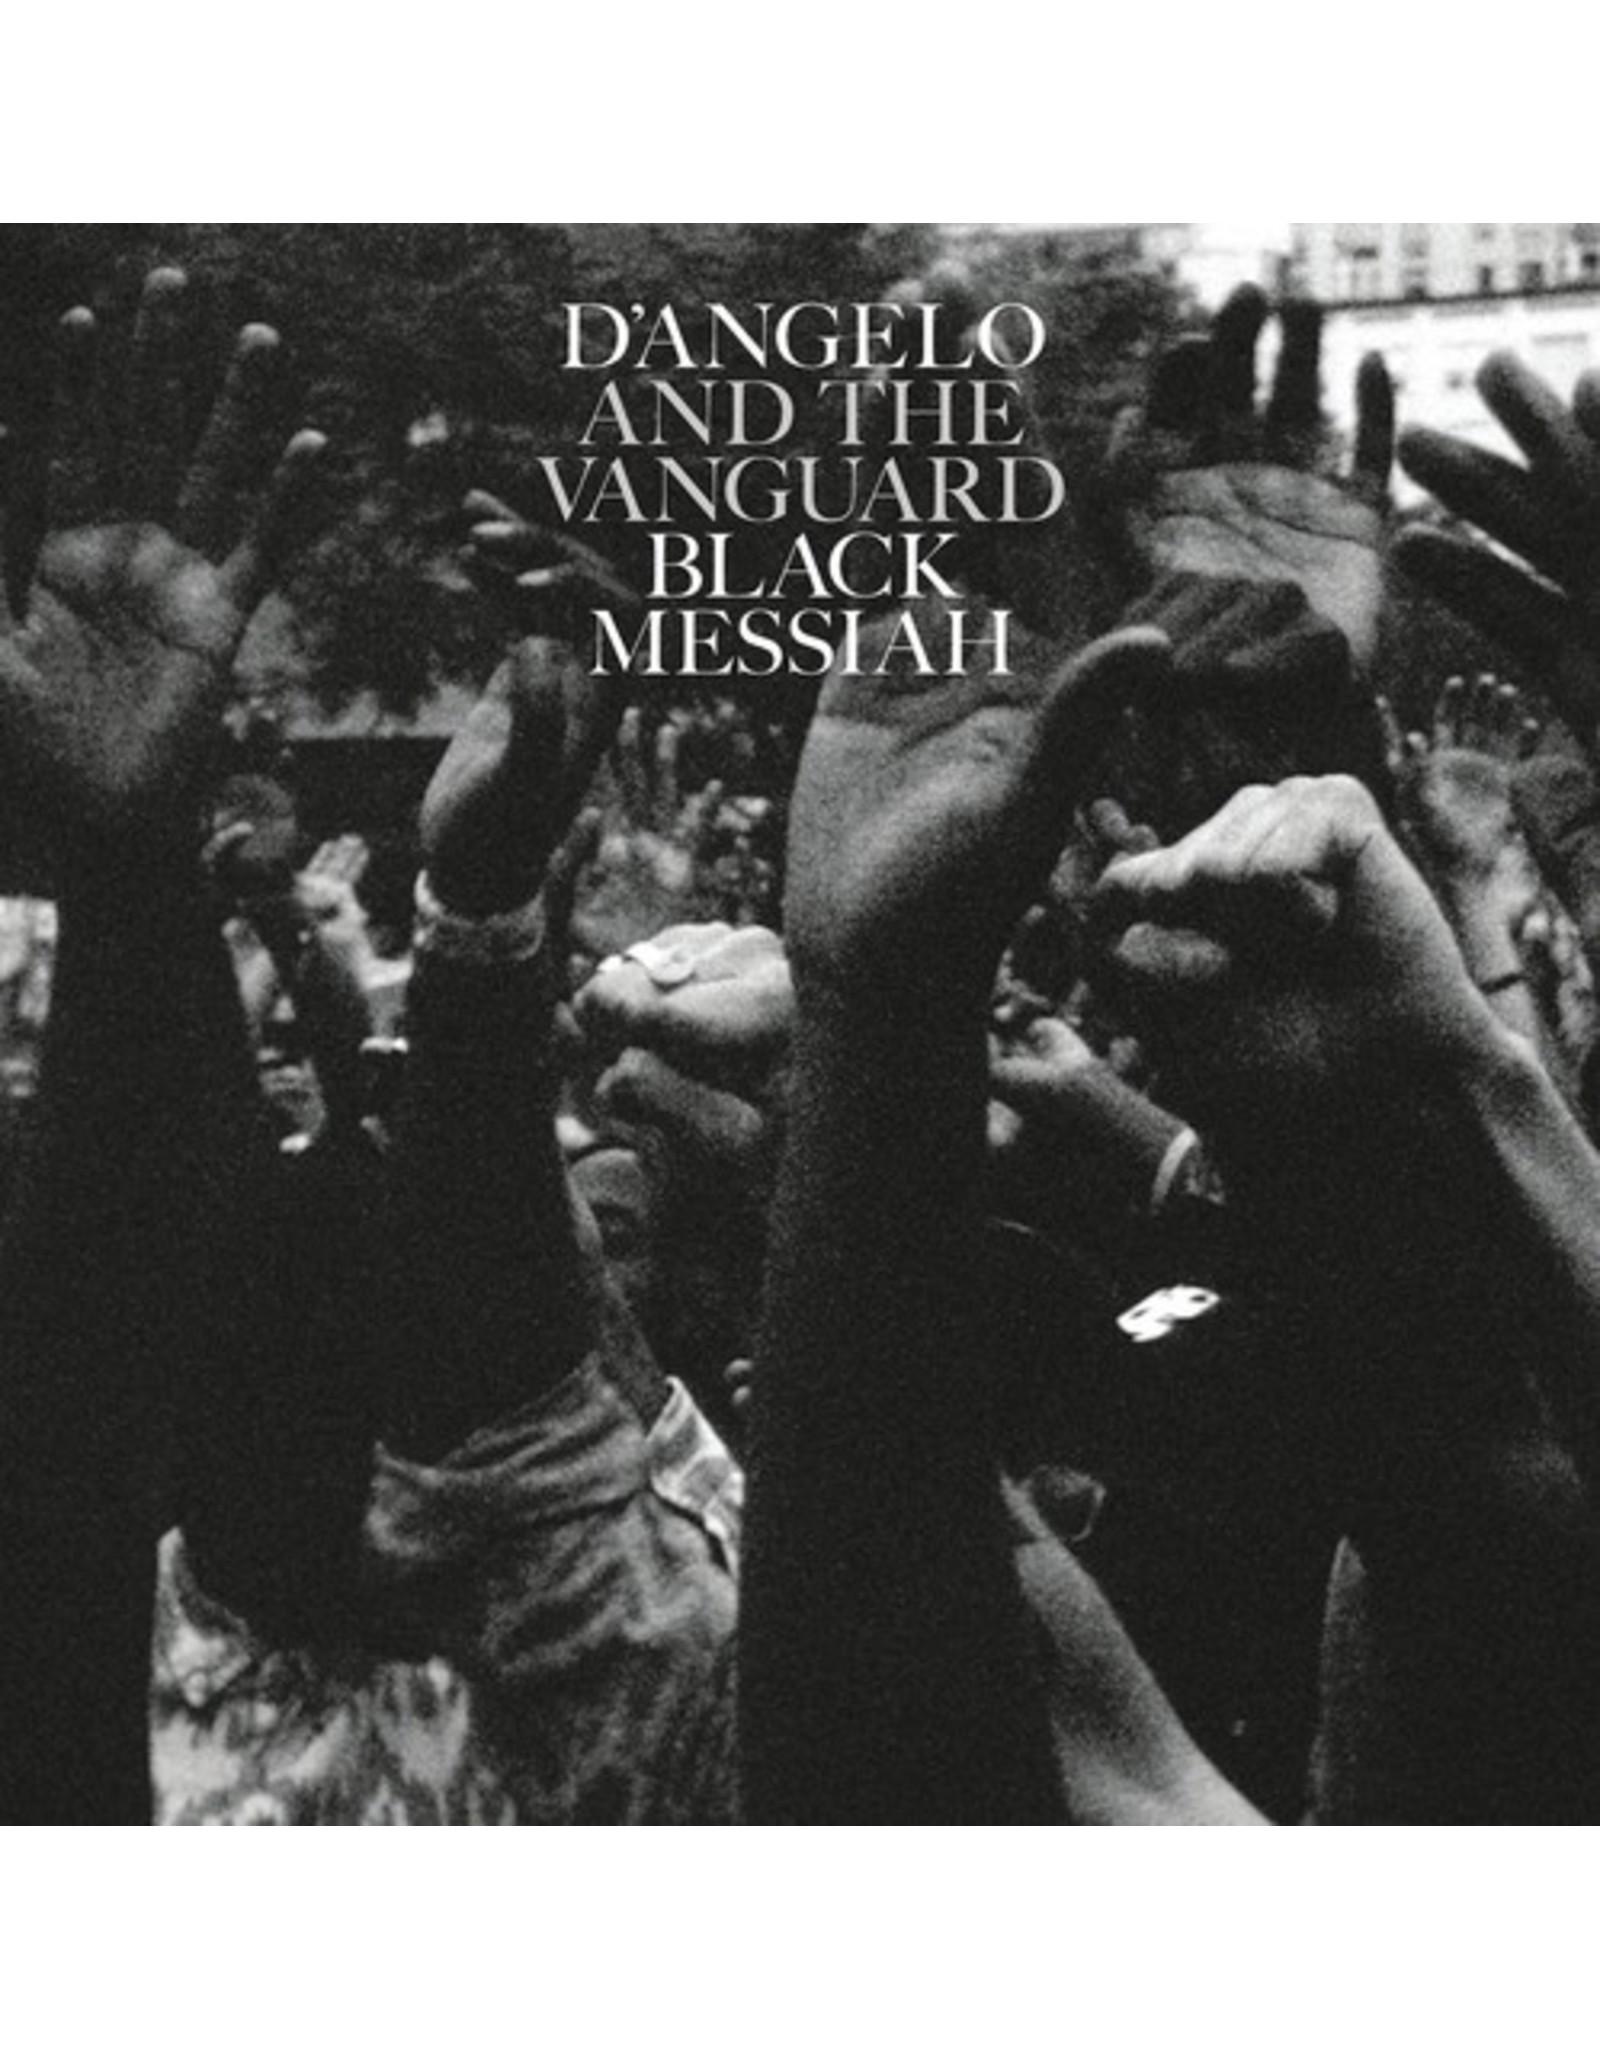 New Vinyl D'Angelo - Black Messiah 2LP